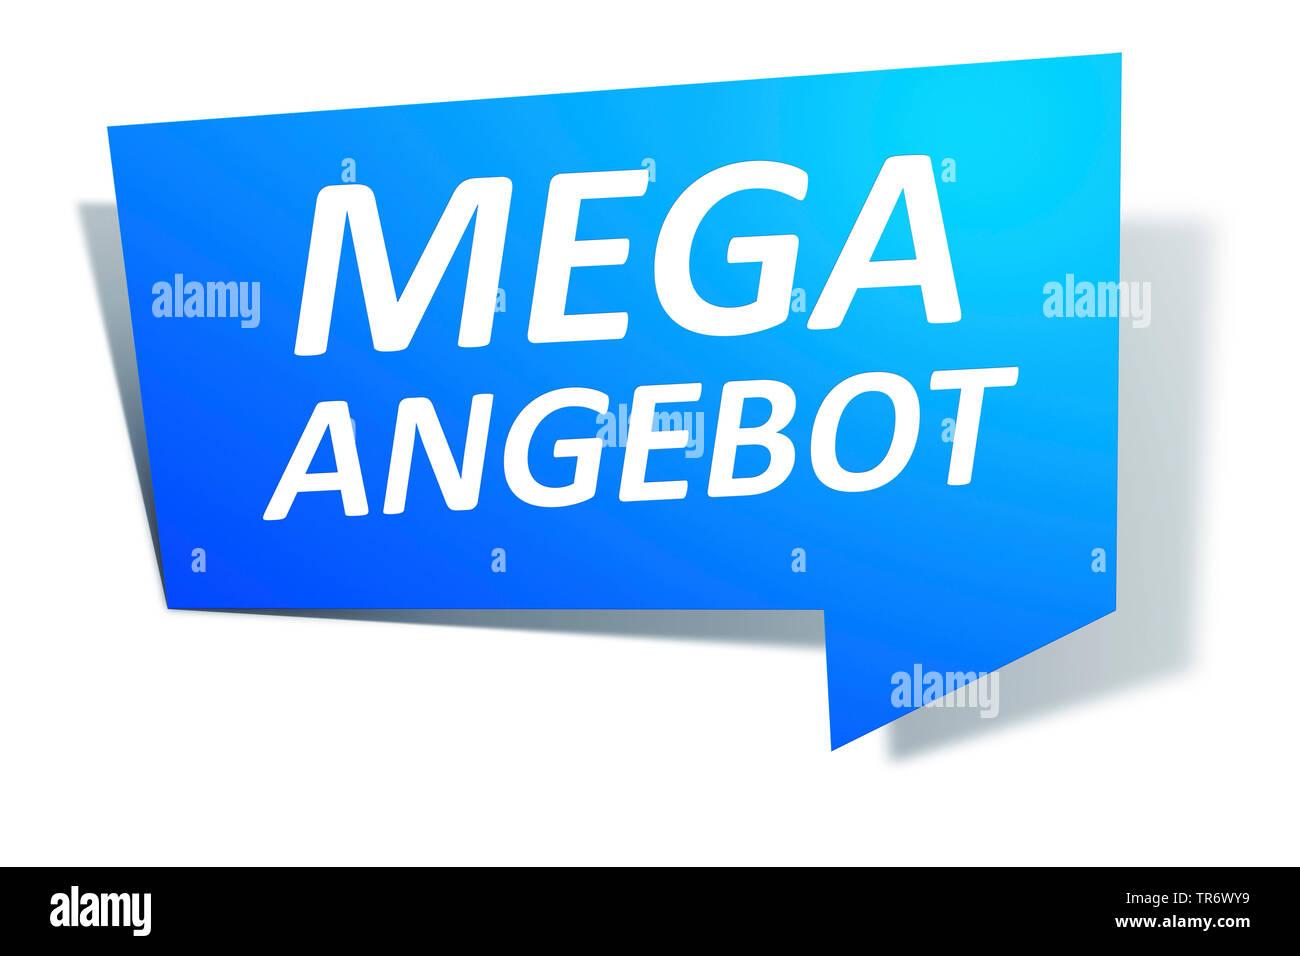 3D Computergrafik, blaue Sprechblase mit Text MEGA Angebot, Europa | 3D computer graphic, blue speech bubble reading MEGA ANGEBOT - TOP OFFERS, Europe - Stock Image